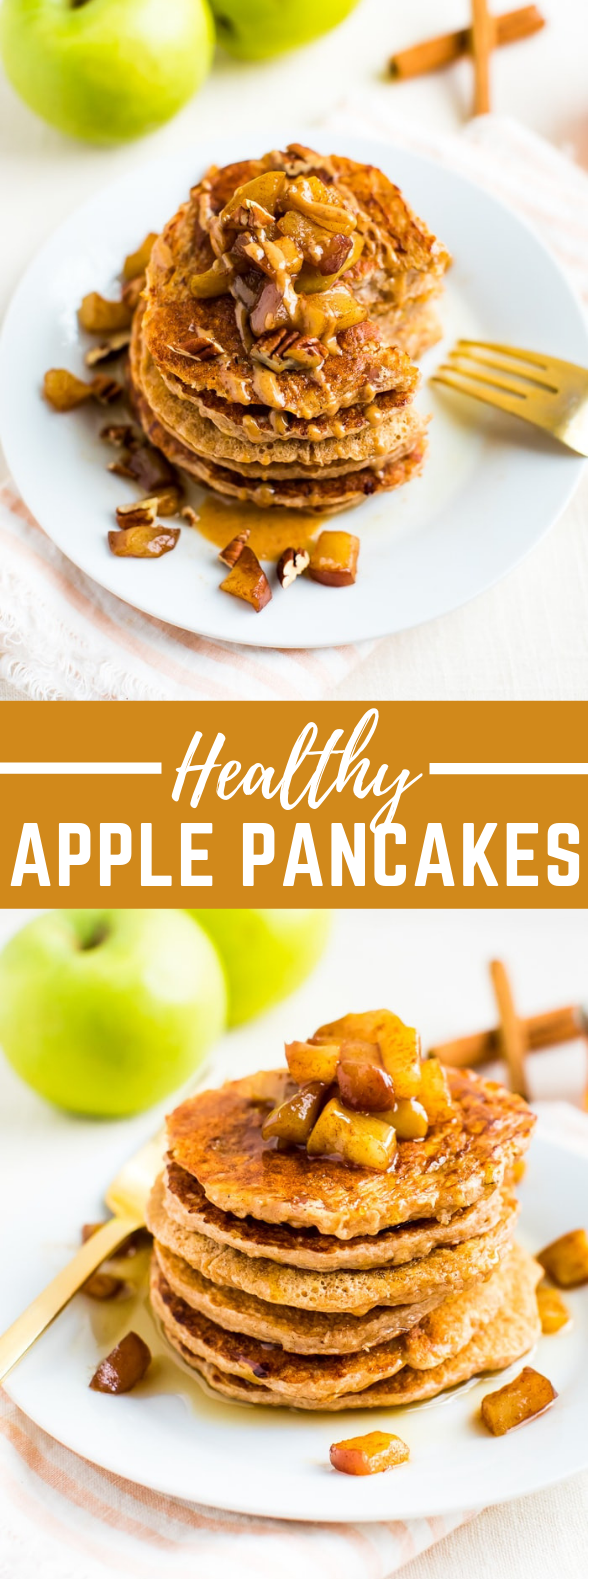 Healthy Apple Pancakes #healthyrecipe #breakfast